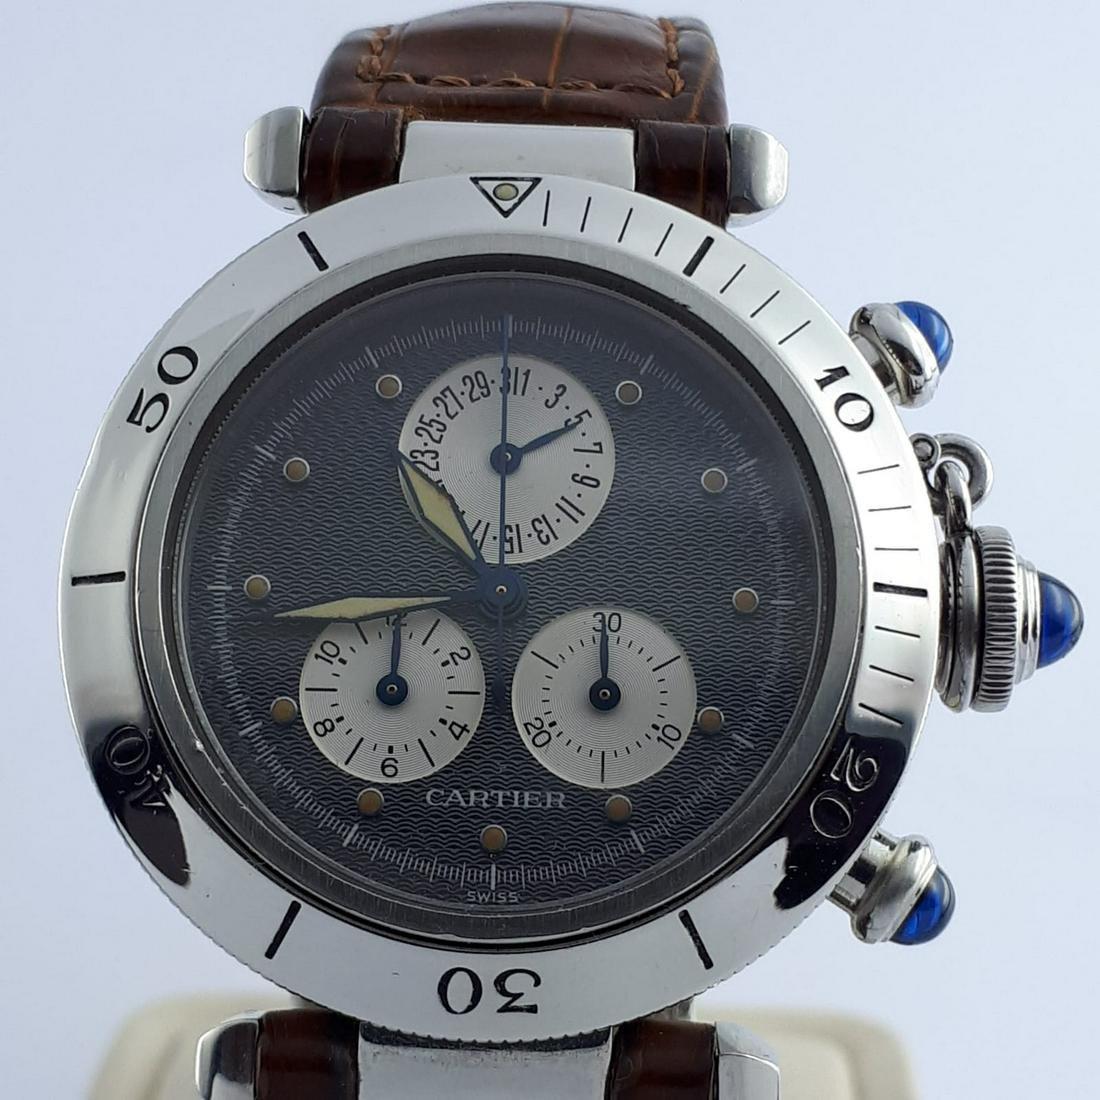 Cartier - Pasha Chronoflex - 1352 1 - Men - 2000-2010